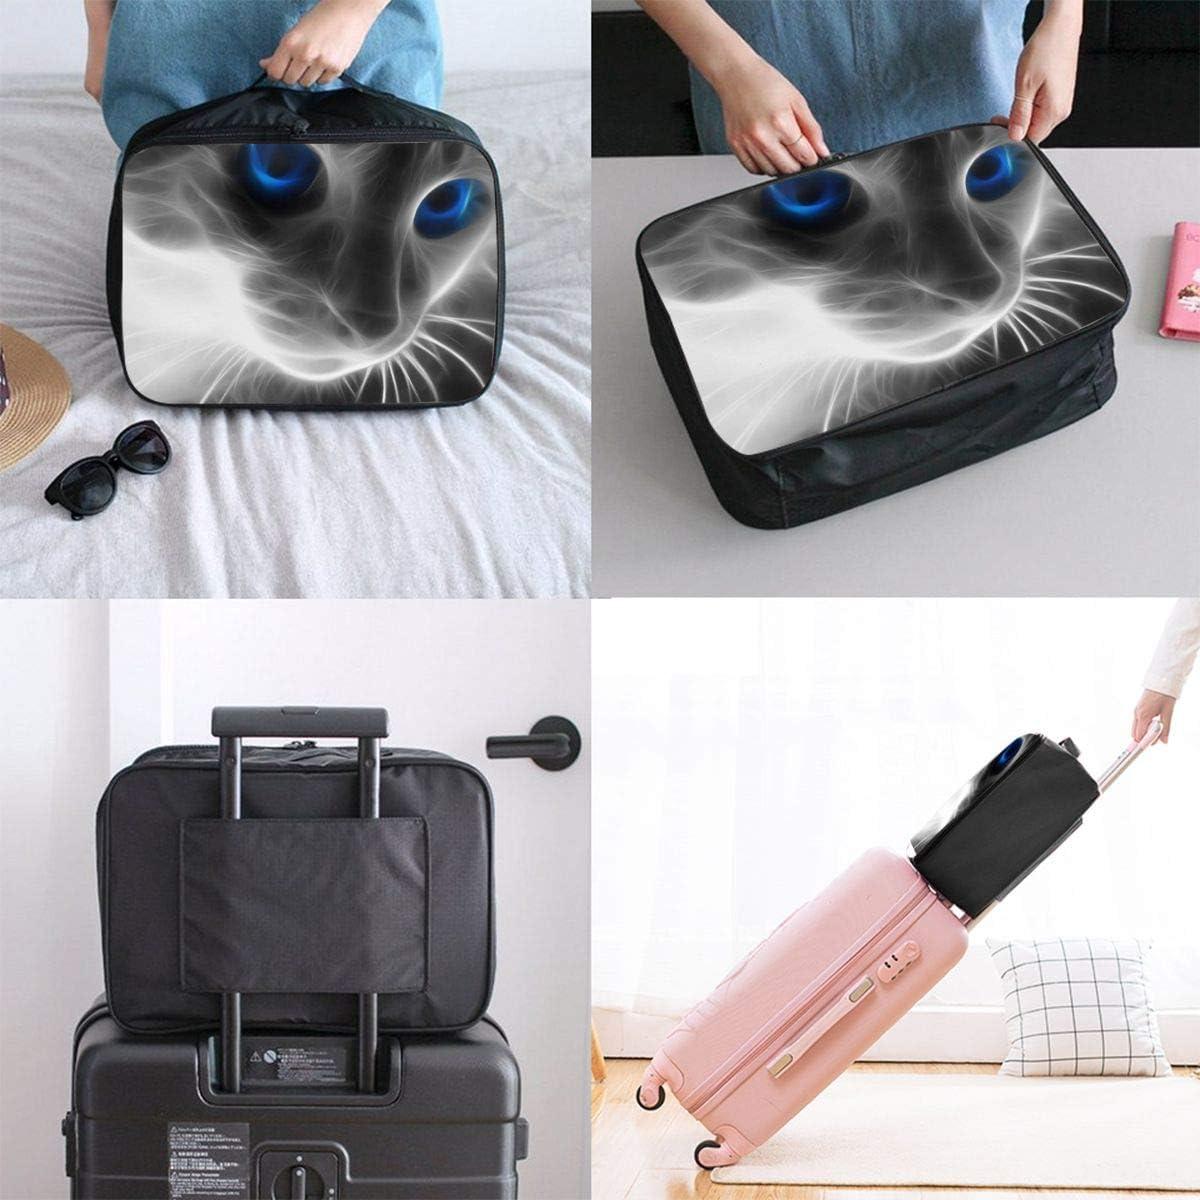 Yunshm Animal Cat Blue Eyes Customized Trolley Handbag Waterproof Unisex Large Capacity For Business Travel Storage